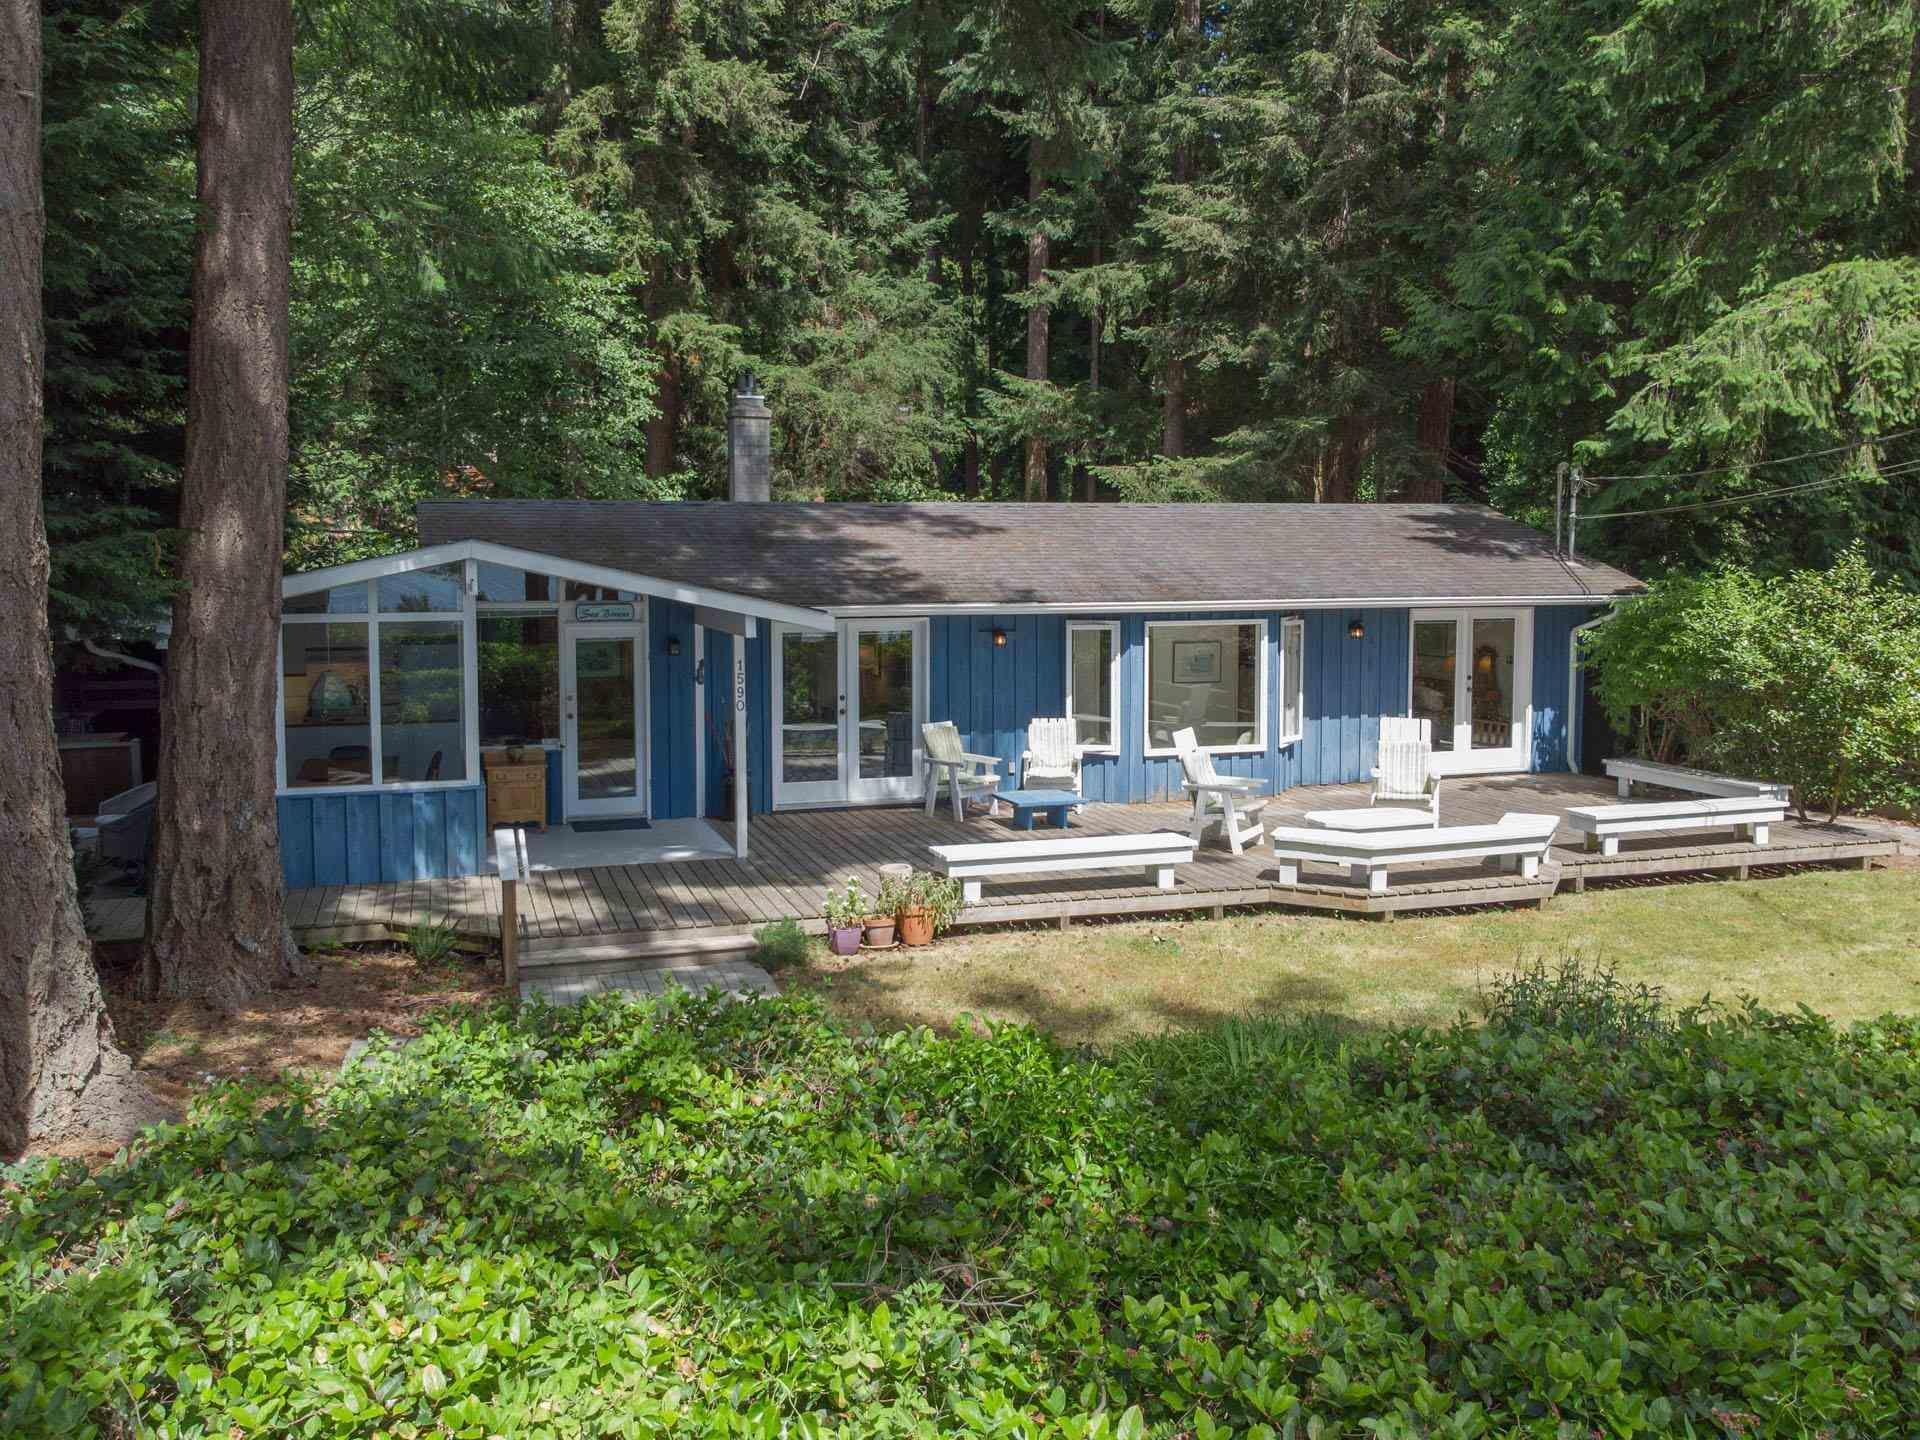 Main Photo: 1590 OCEAN BEACH Esplanade in Gibsons: Gibsons & Area House for sale (Sunshine Coast)  : MLS®# R2598013